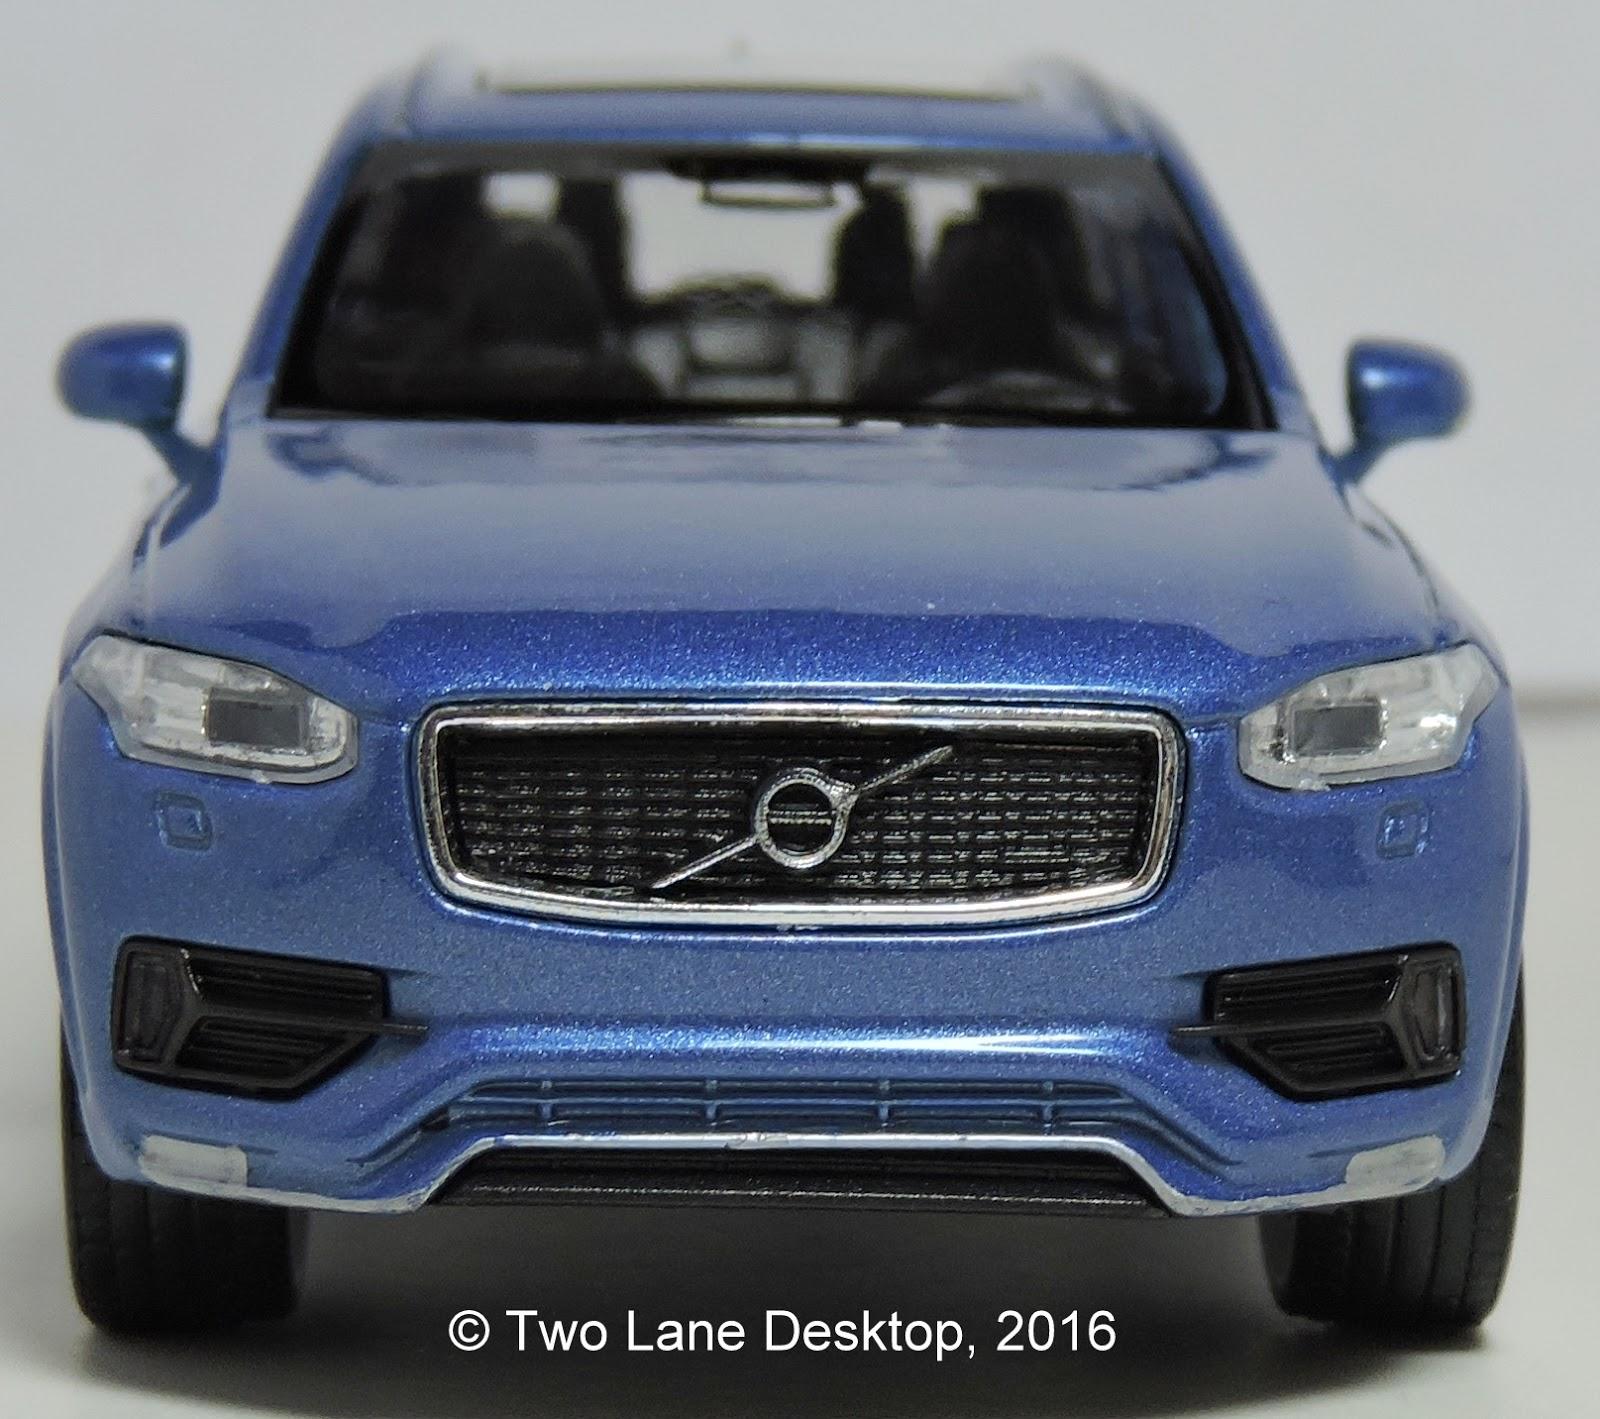 Volvo Xc90 Interior Lights Wont Turn Off: Two Lane Desktop: Matchbox & Majorette 1:64 2005 & Welly 1